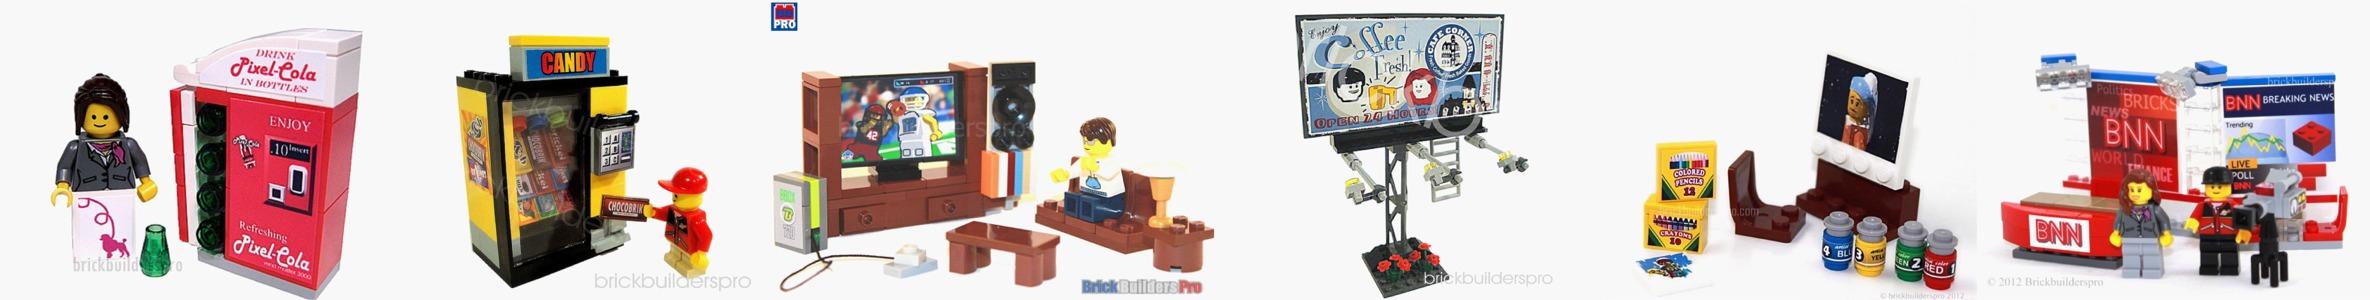 brickbuilderspro-ideas.jpg